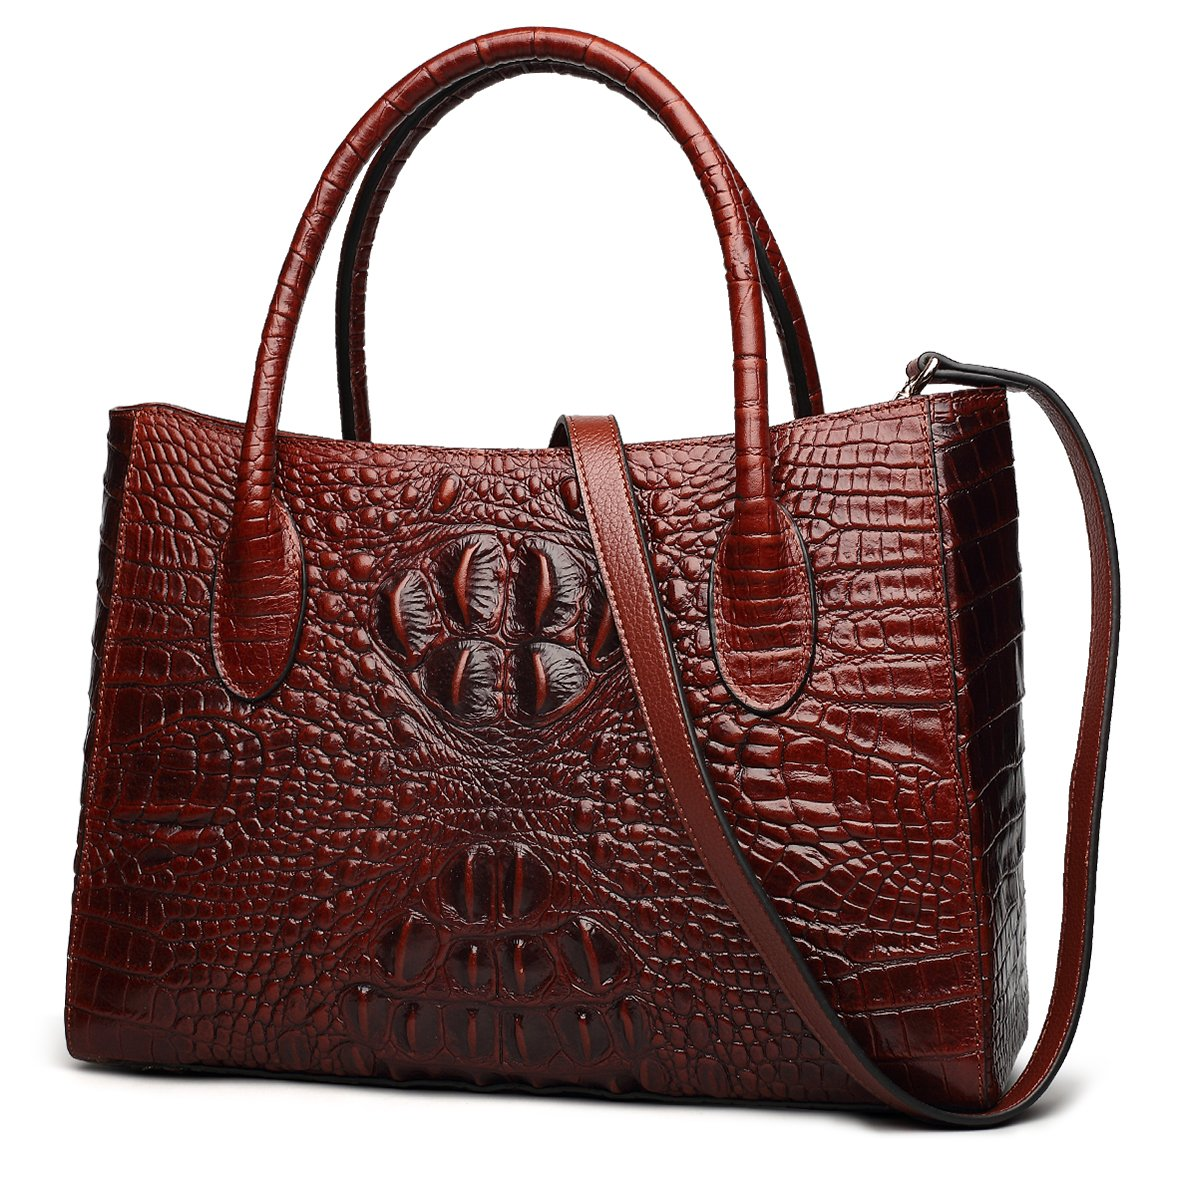 ZOOLER GLOBAL Genuine Leather Handbag Purses for Women Crocodile Embrossed Red